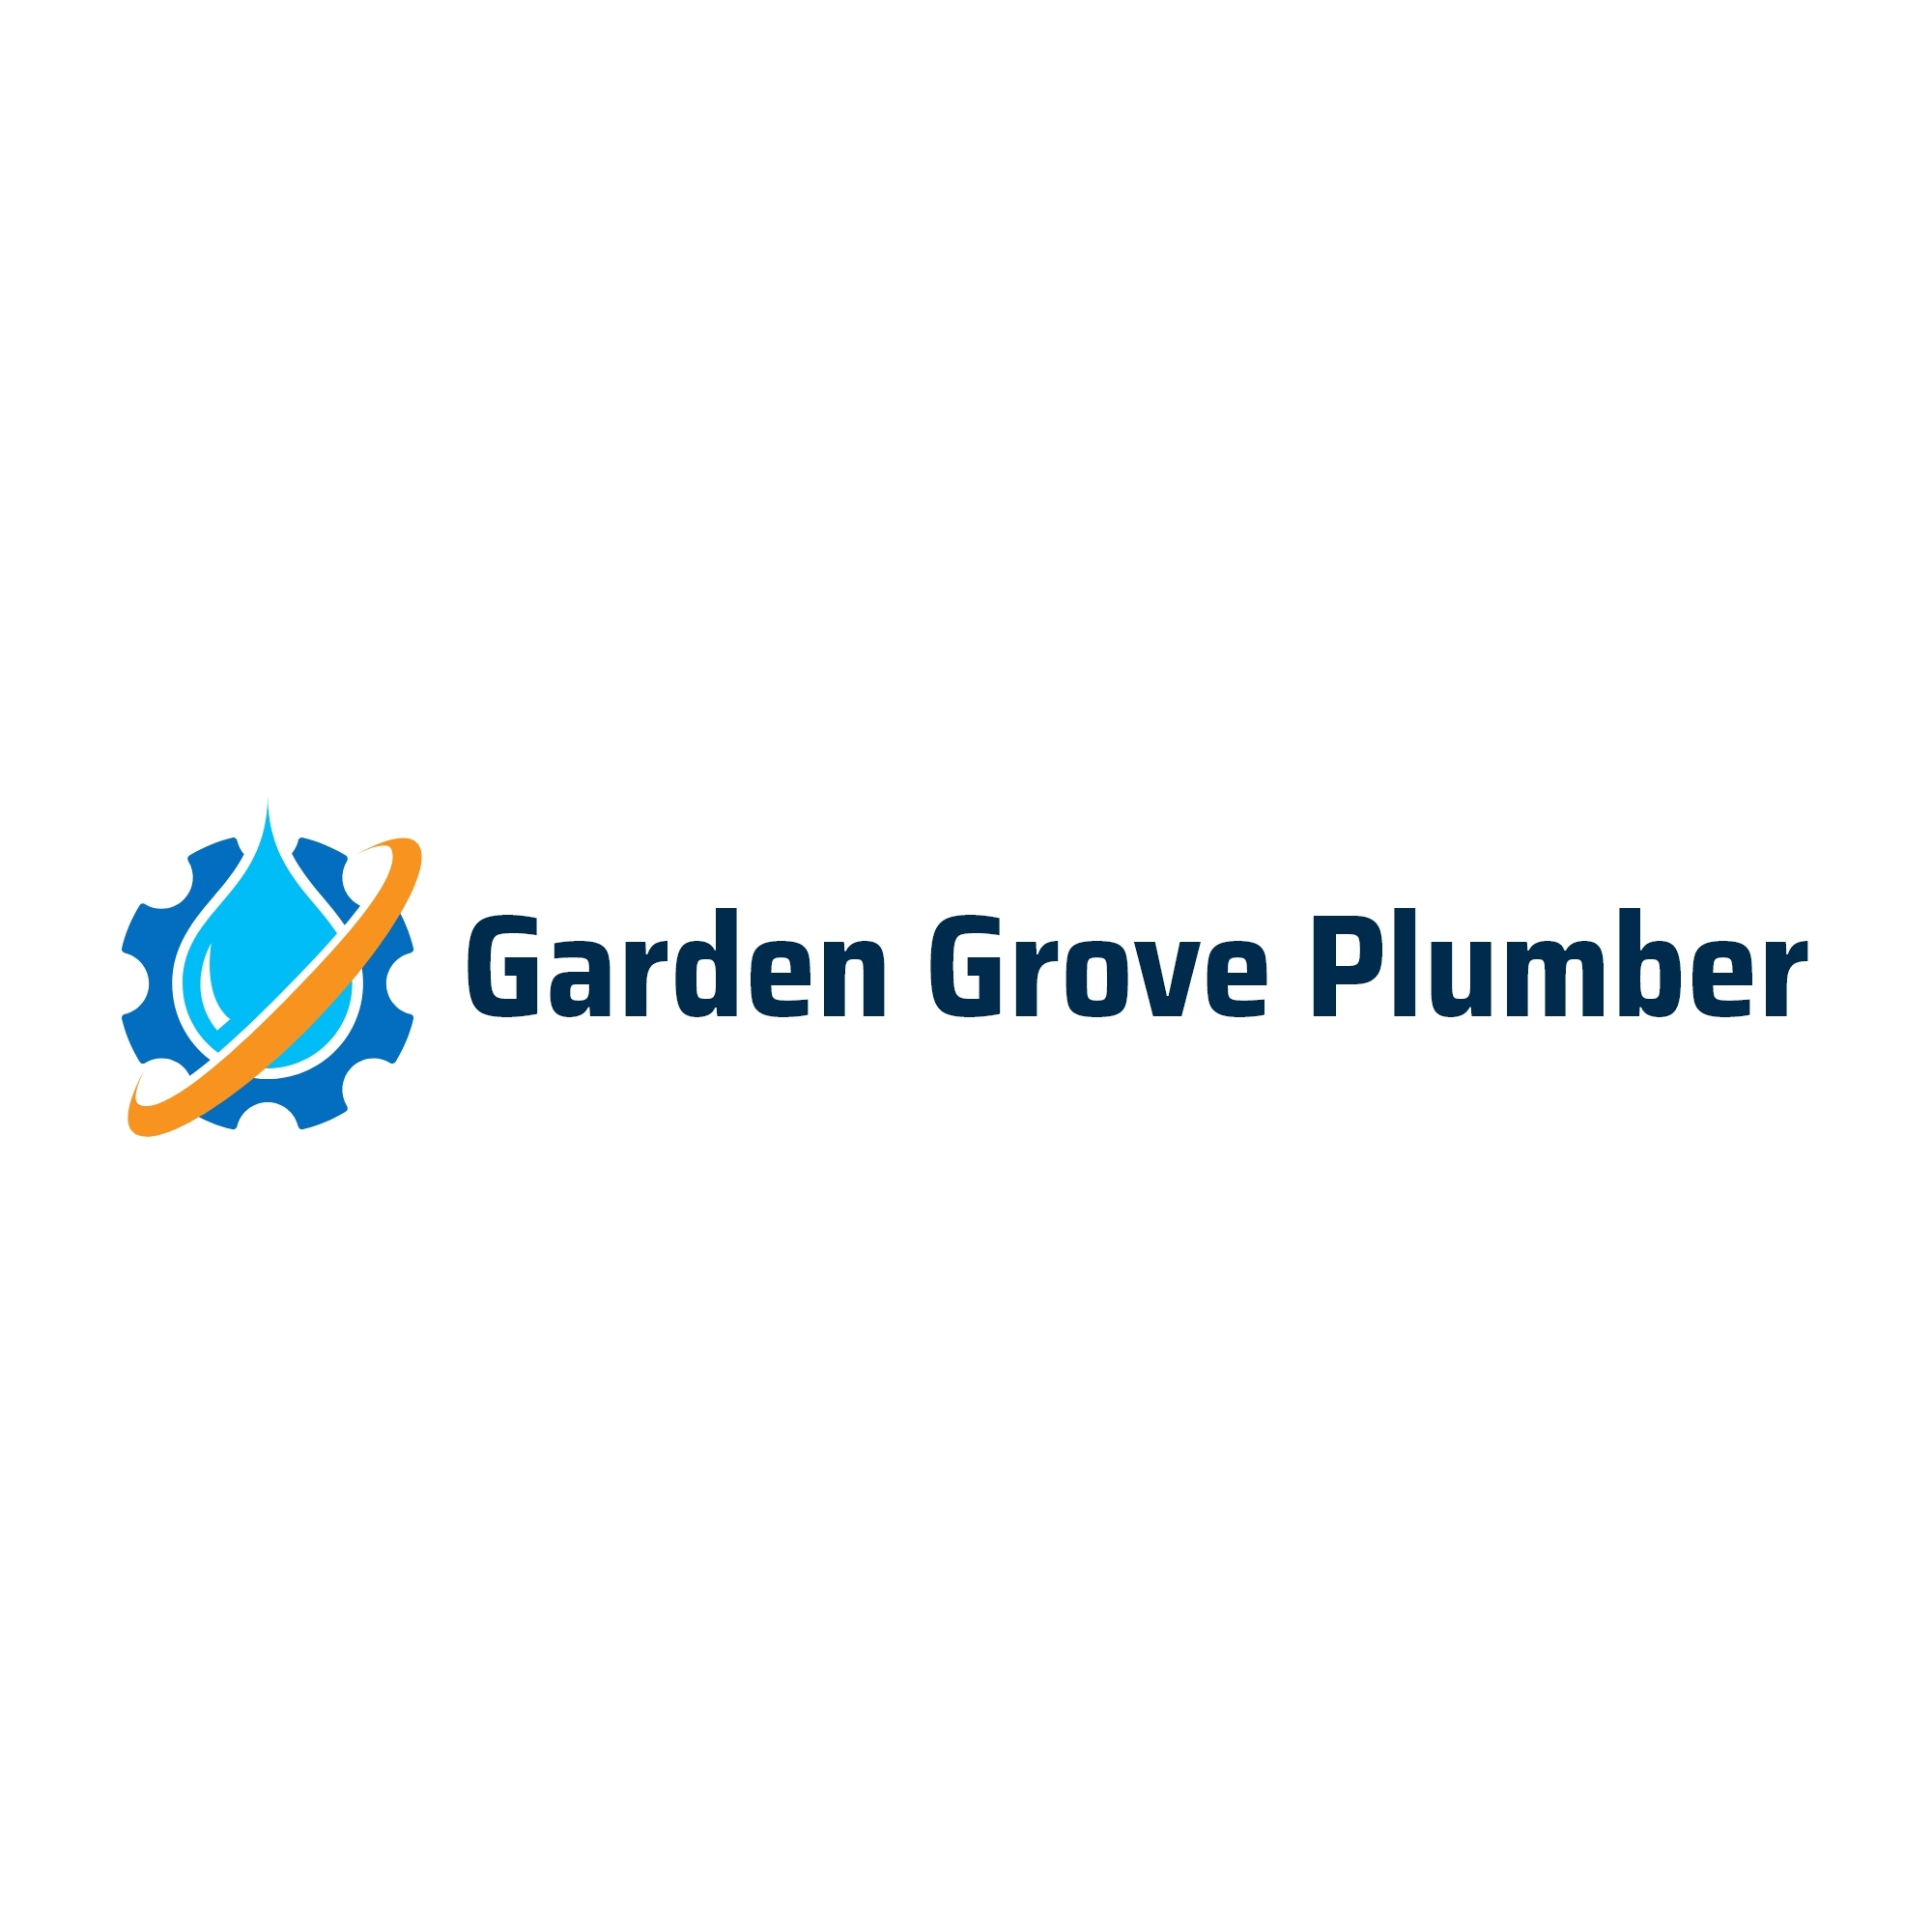 Garden Grove Plumber Announces The Launch of Their Website